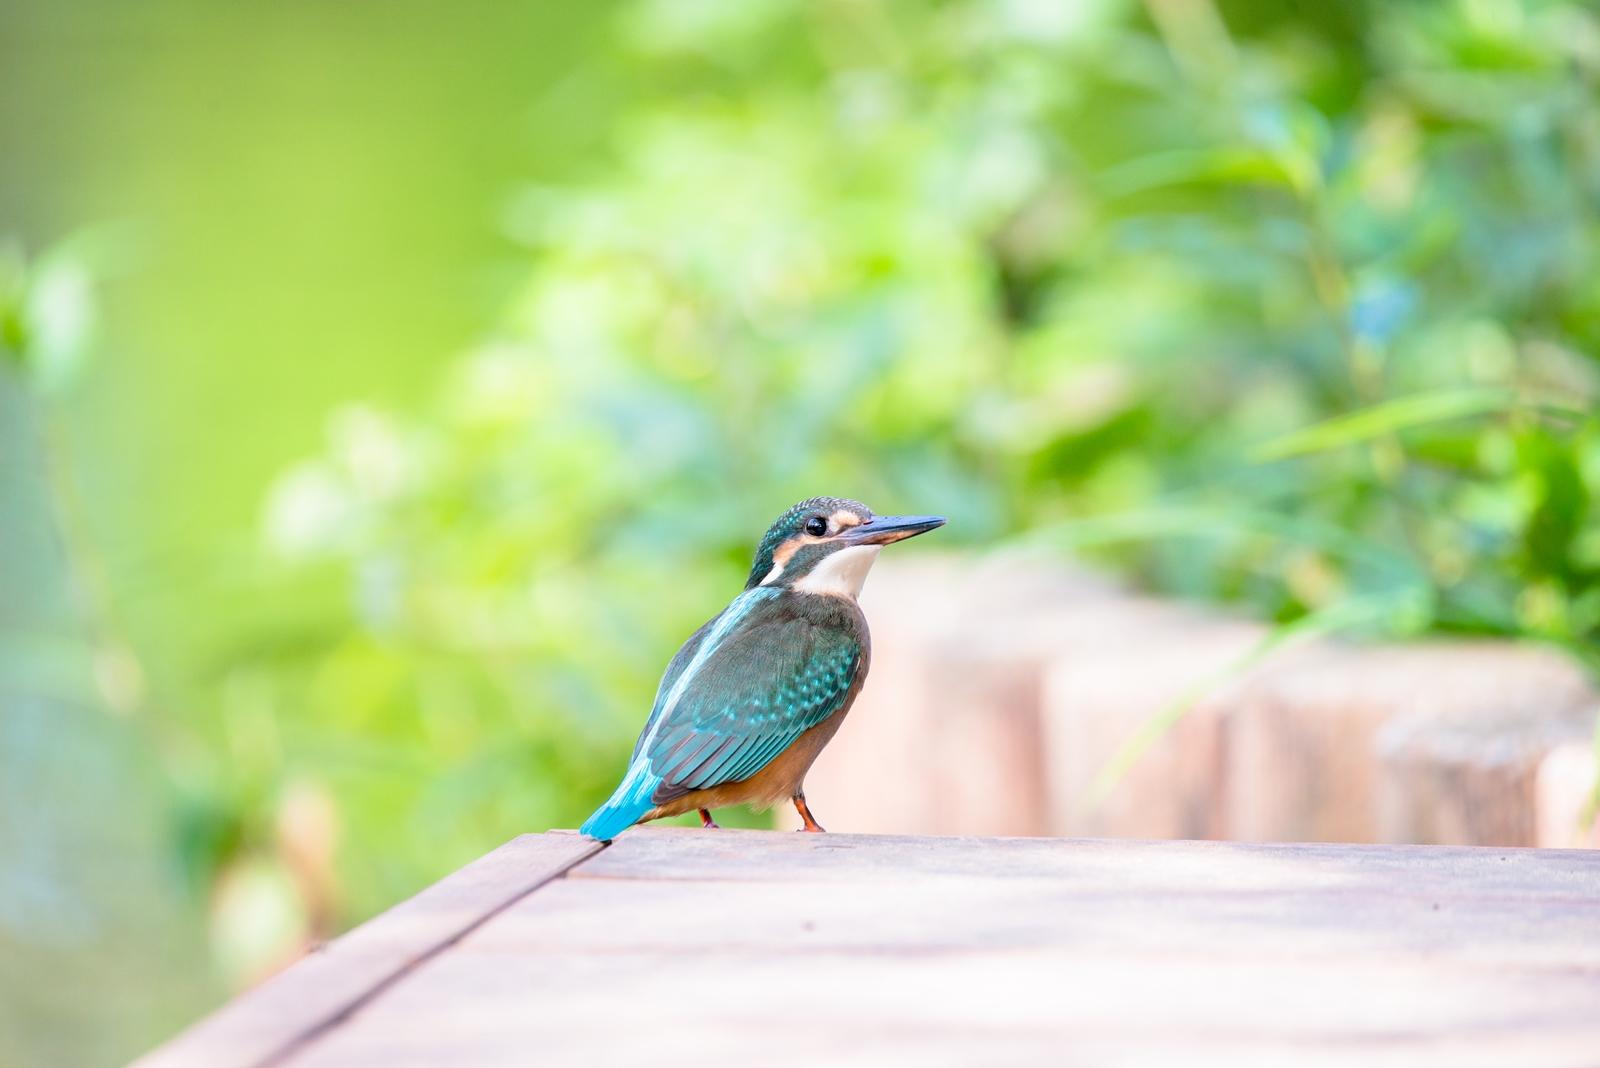 Photo: そっと見返る Look back.  朝の散歩みち 目の前に立つ小さな姿 ふと見返る 美味しいご飯とれたかな  Kingfisher. (カワセミ)  #birdphotography #birds #cooljapan #kawaii #nikon #sigma  Nikon D800E SIGMA 150-600mm F5-6.3 DG OS HSM Contemporary